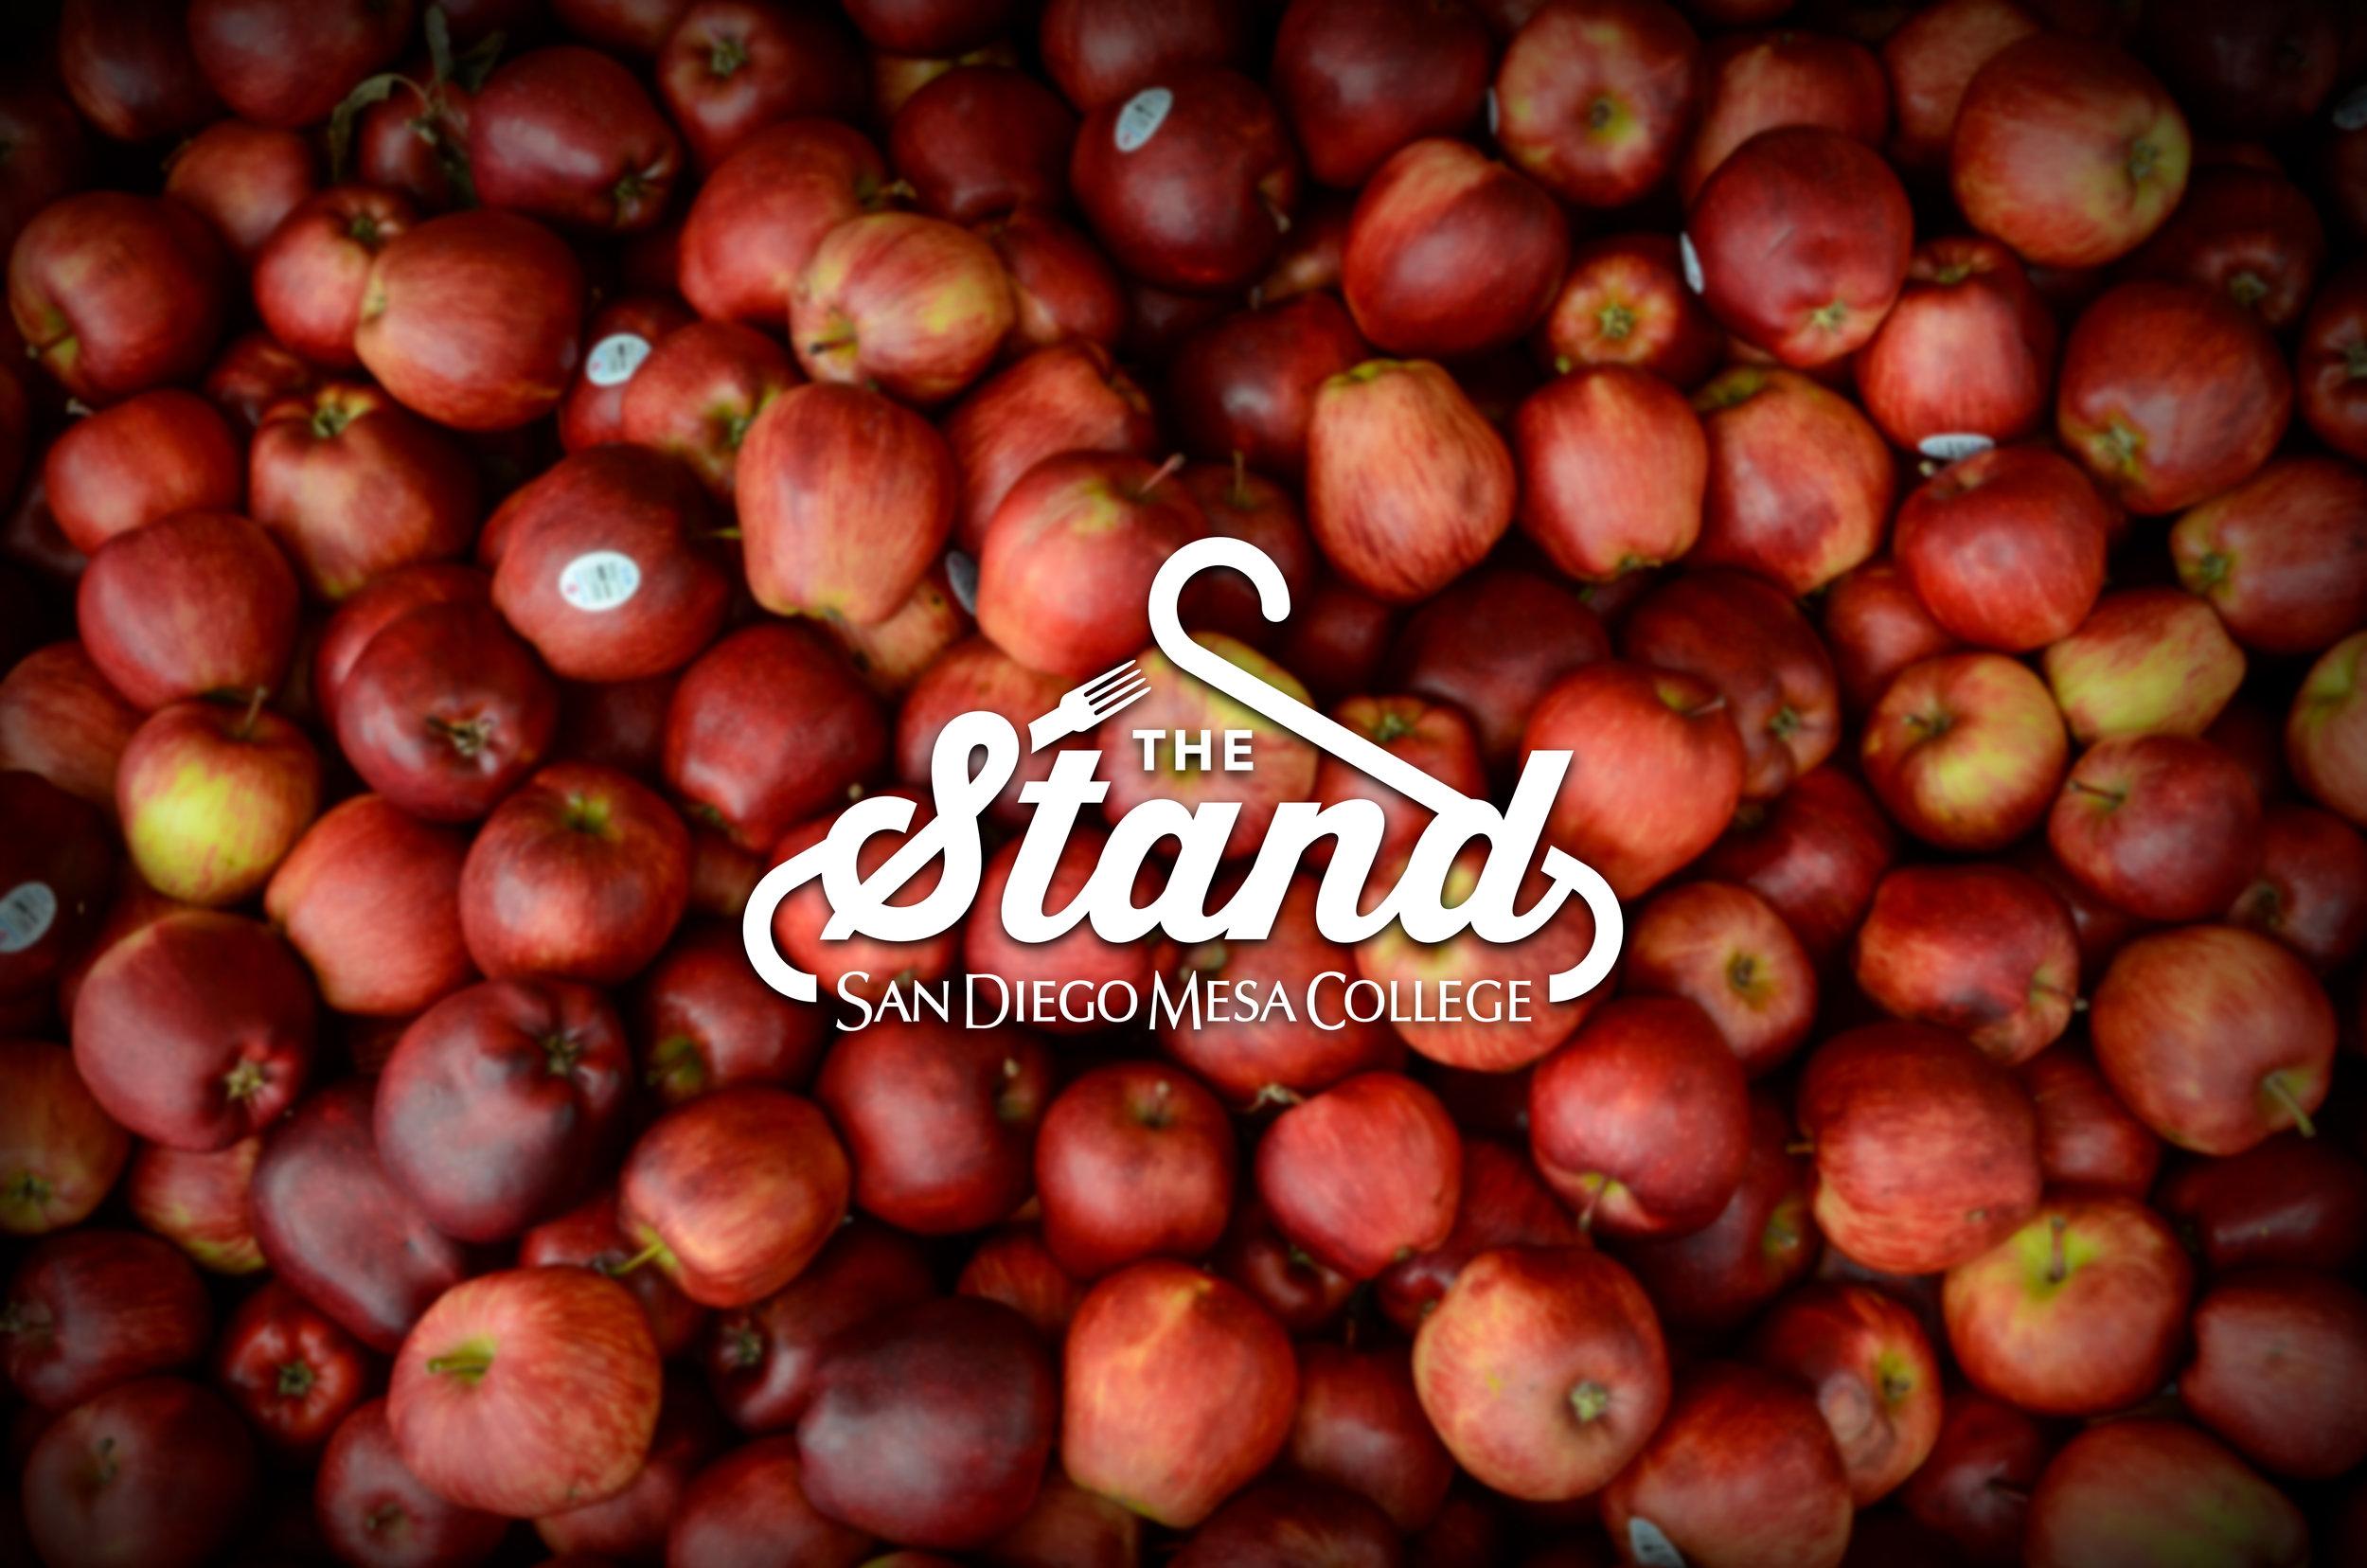 stand-farmers-market18-236copyV02.jpg